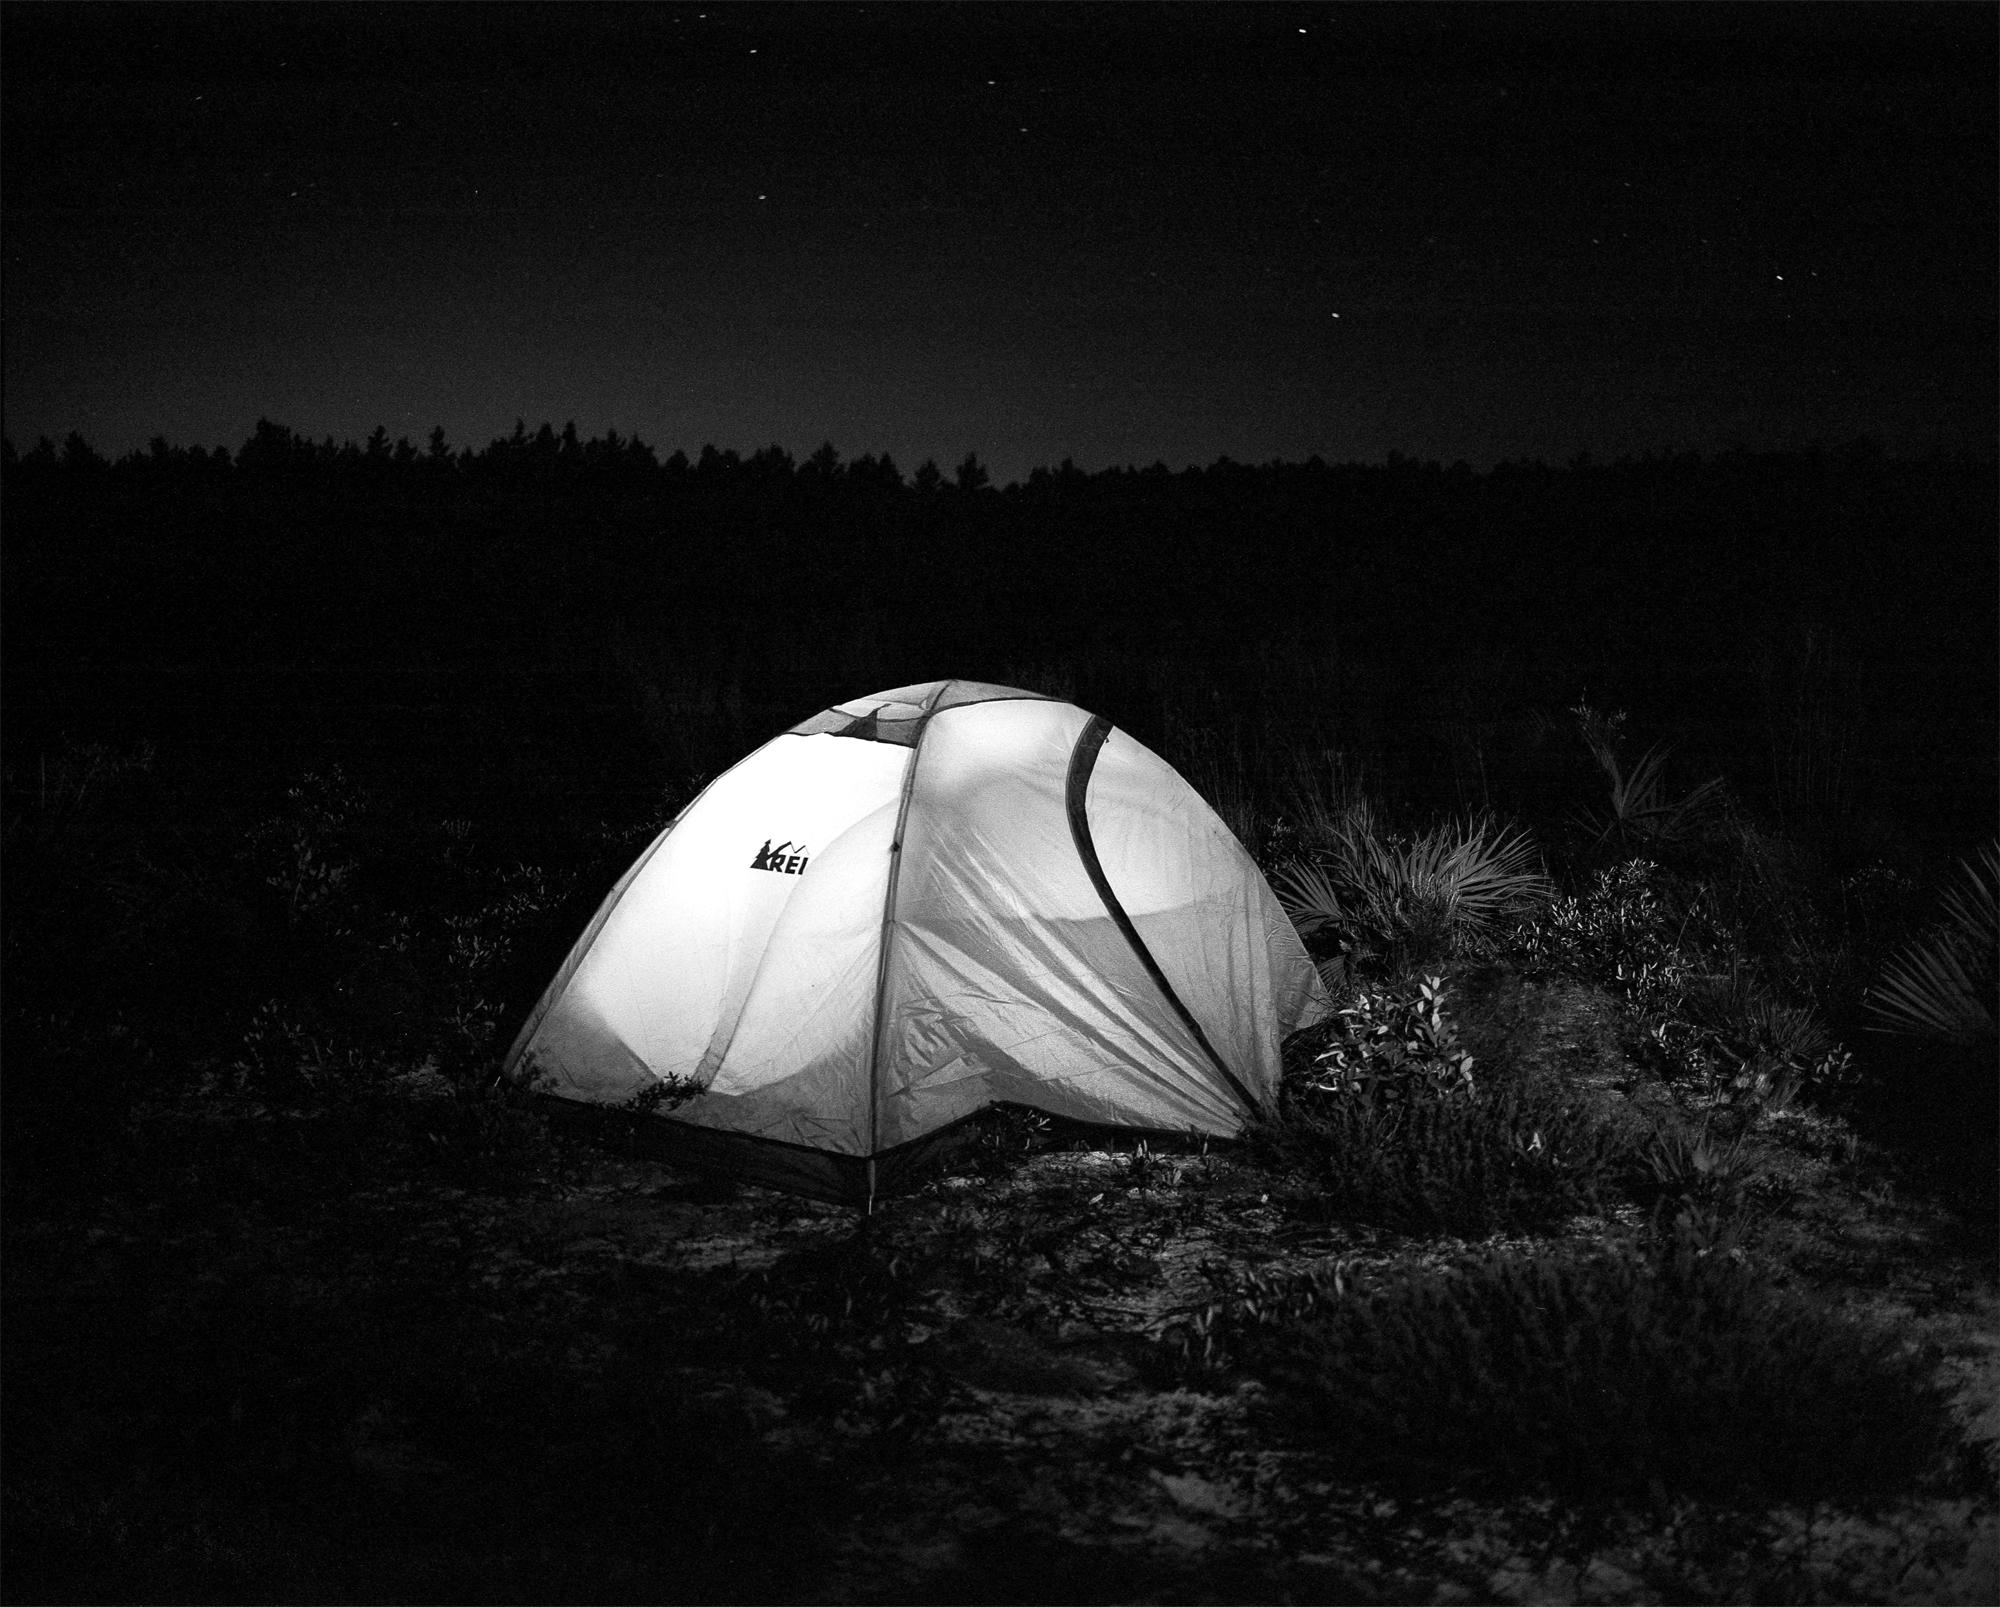 My tent beneath the stars in the Juniper Prairie Wilderness. Shot details: Mamiya 7ii, 80mm f/4, Kodak Tri-X 400 pushed to 1600, Nikon SB910 fired remotely